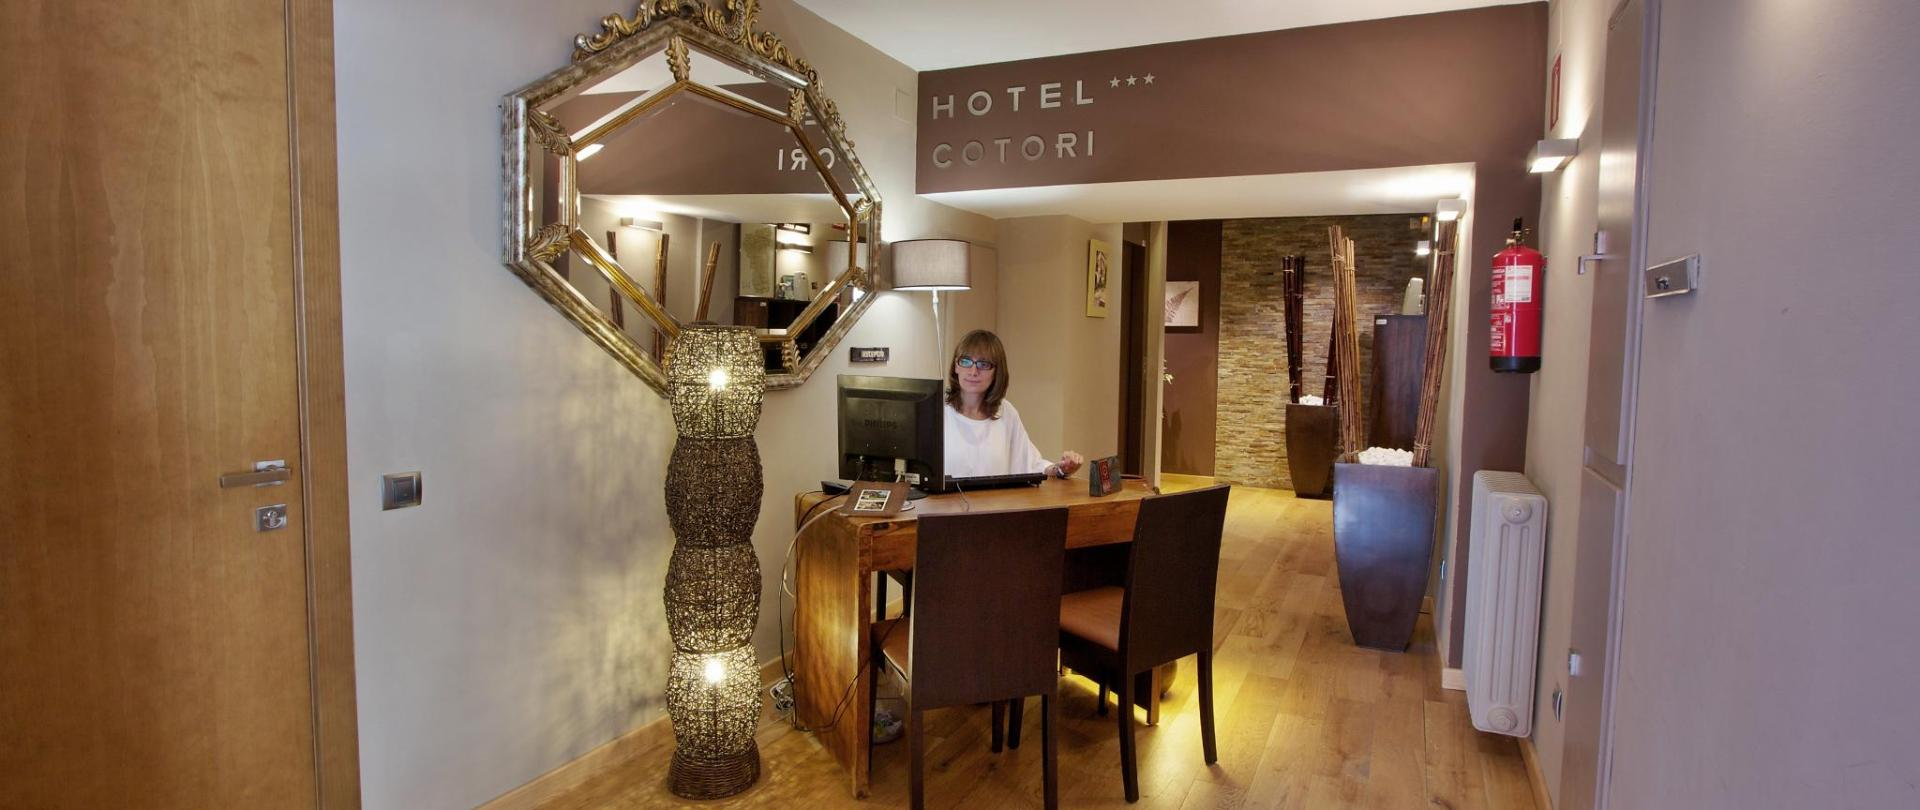 HOTEL COTORI 19 - Foto Sergi Ricart.JPG